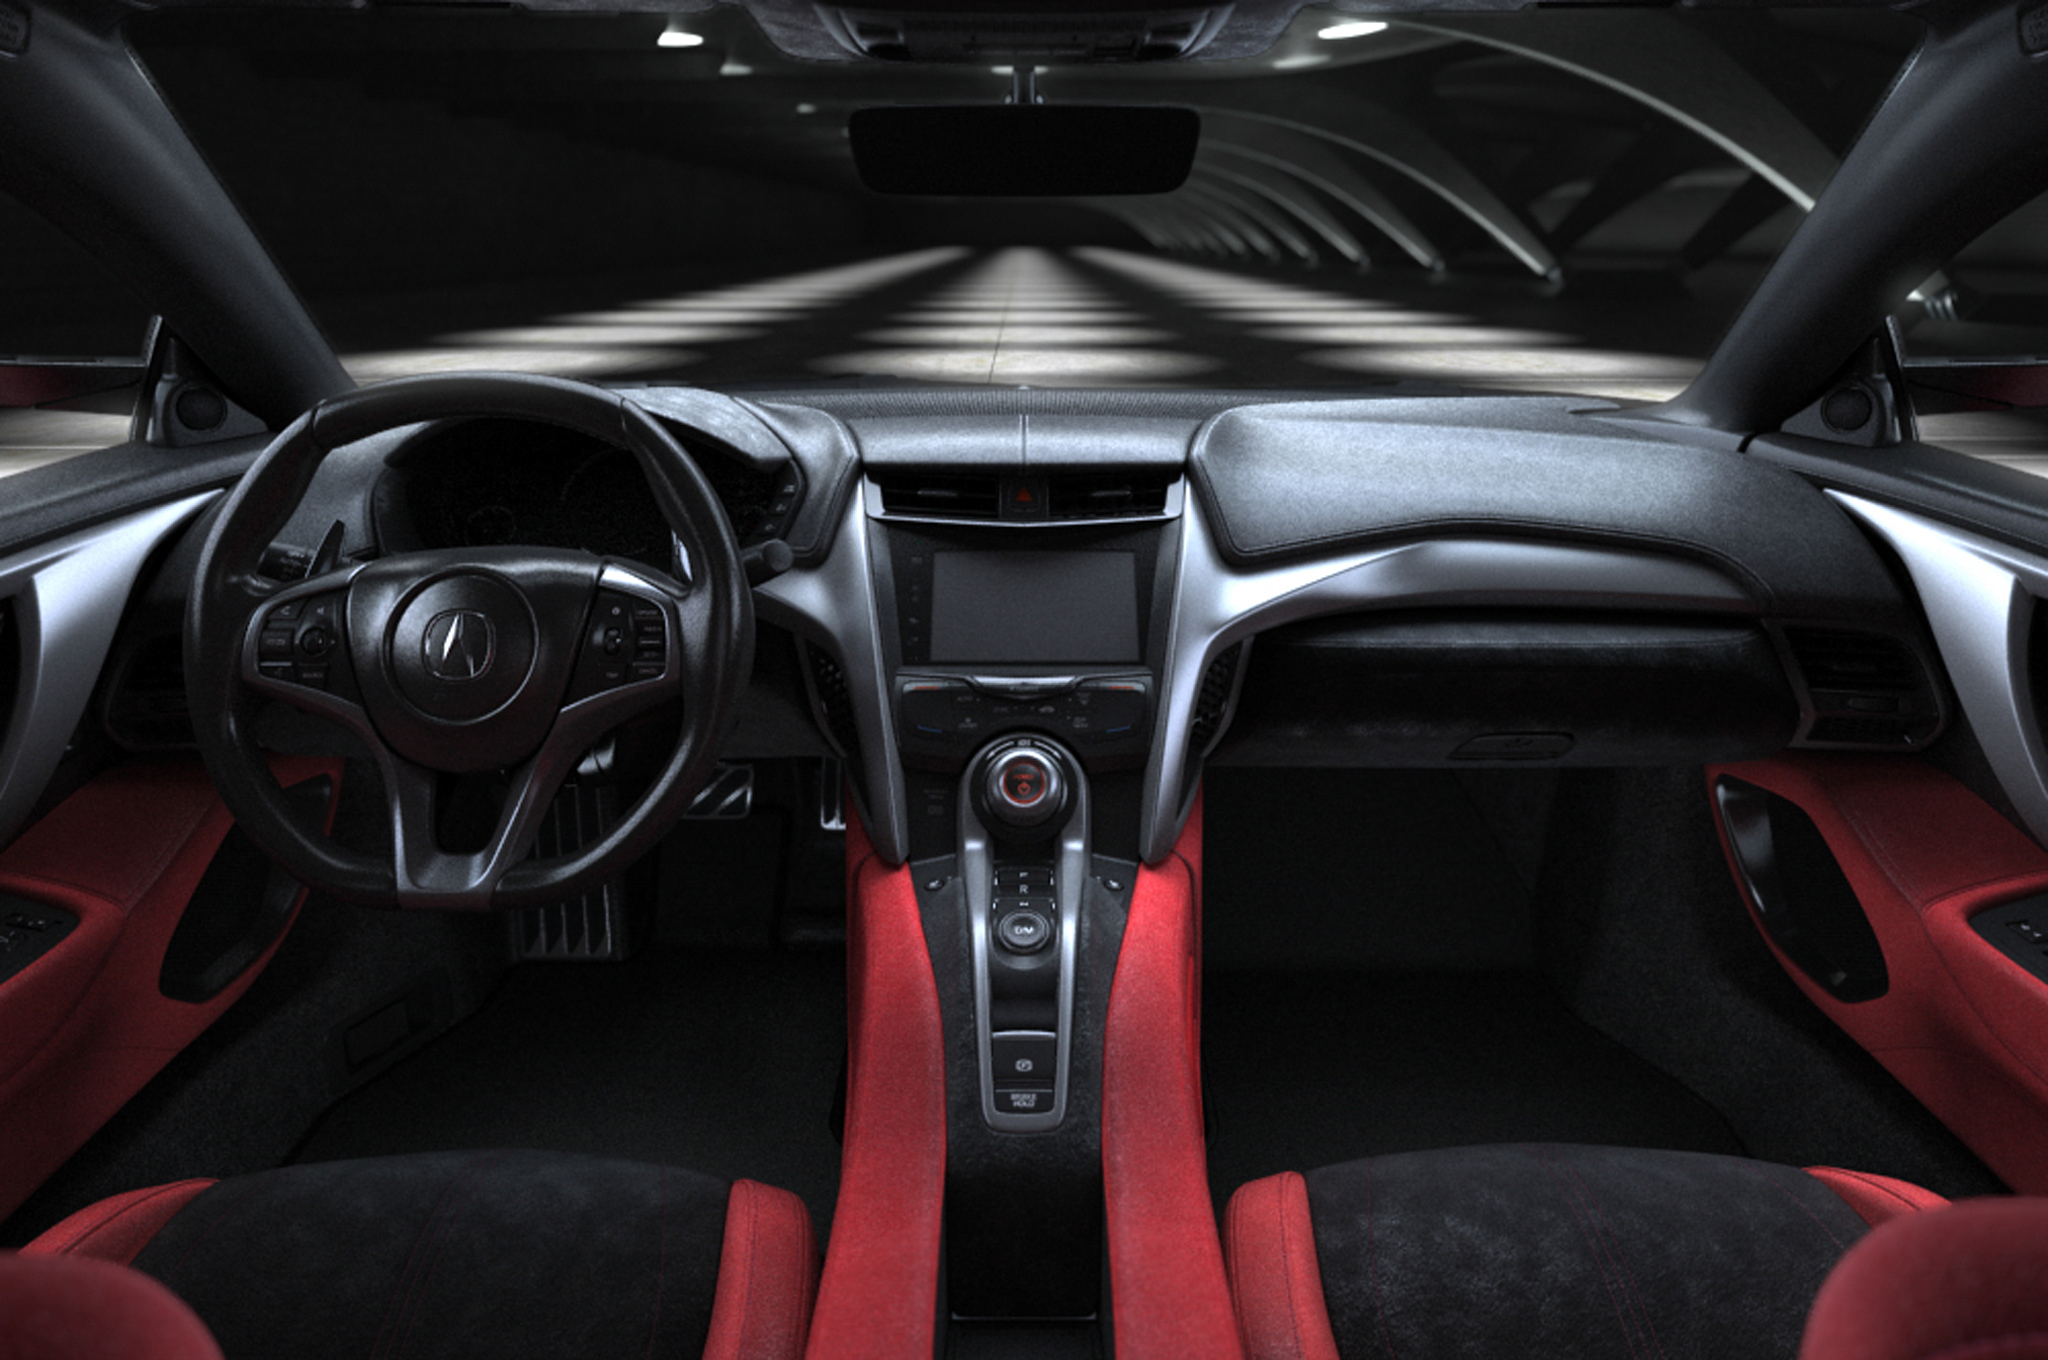 2016 Acura NSX Interior Dashboard